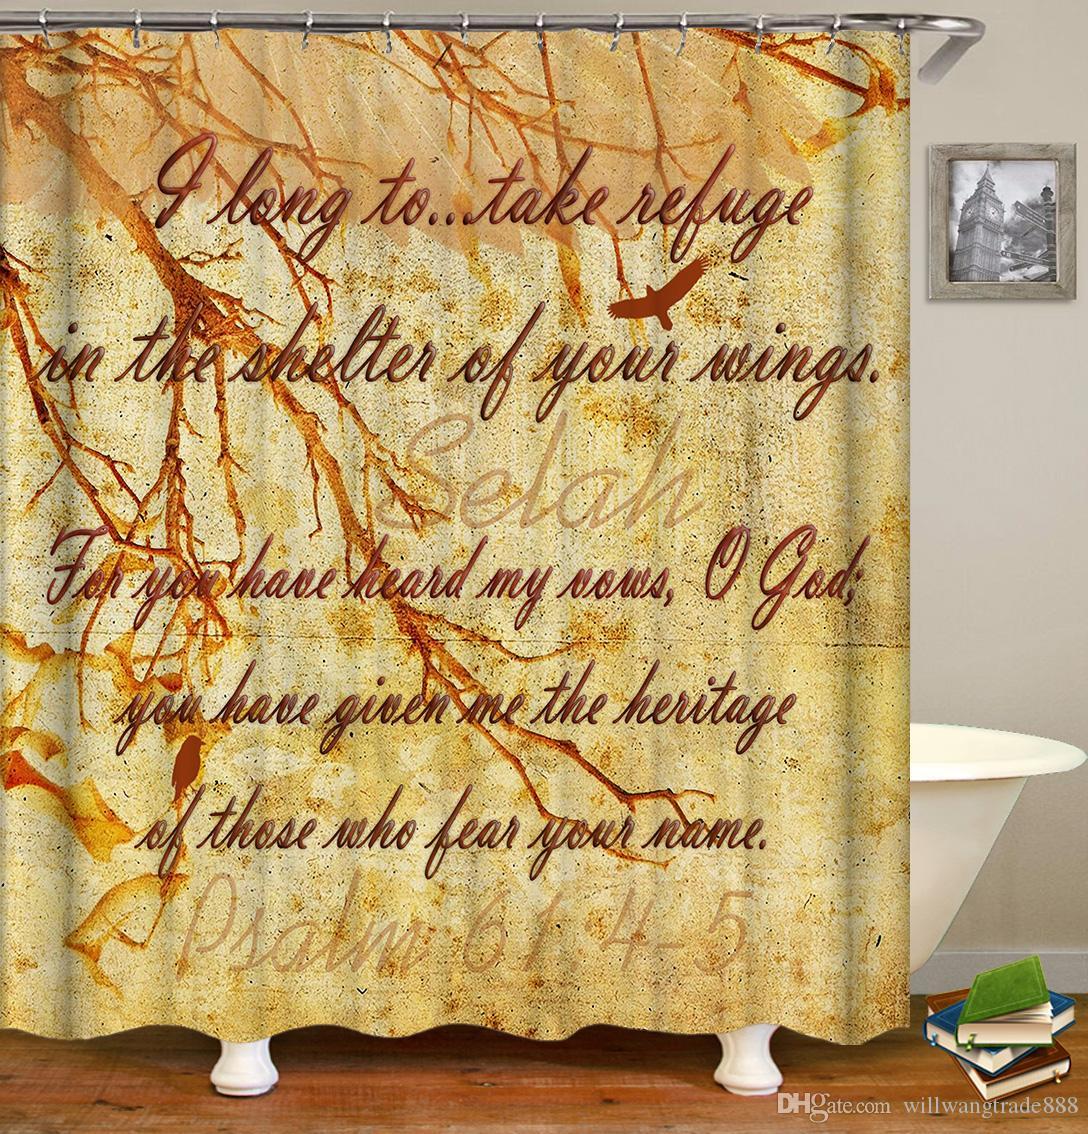 90x180cm 150x180cm 120x180cm Waterproof Retro Proverb motto Verse Poetry Letters Sentences Digital Printing Bathroom Shower Window Curtain